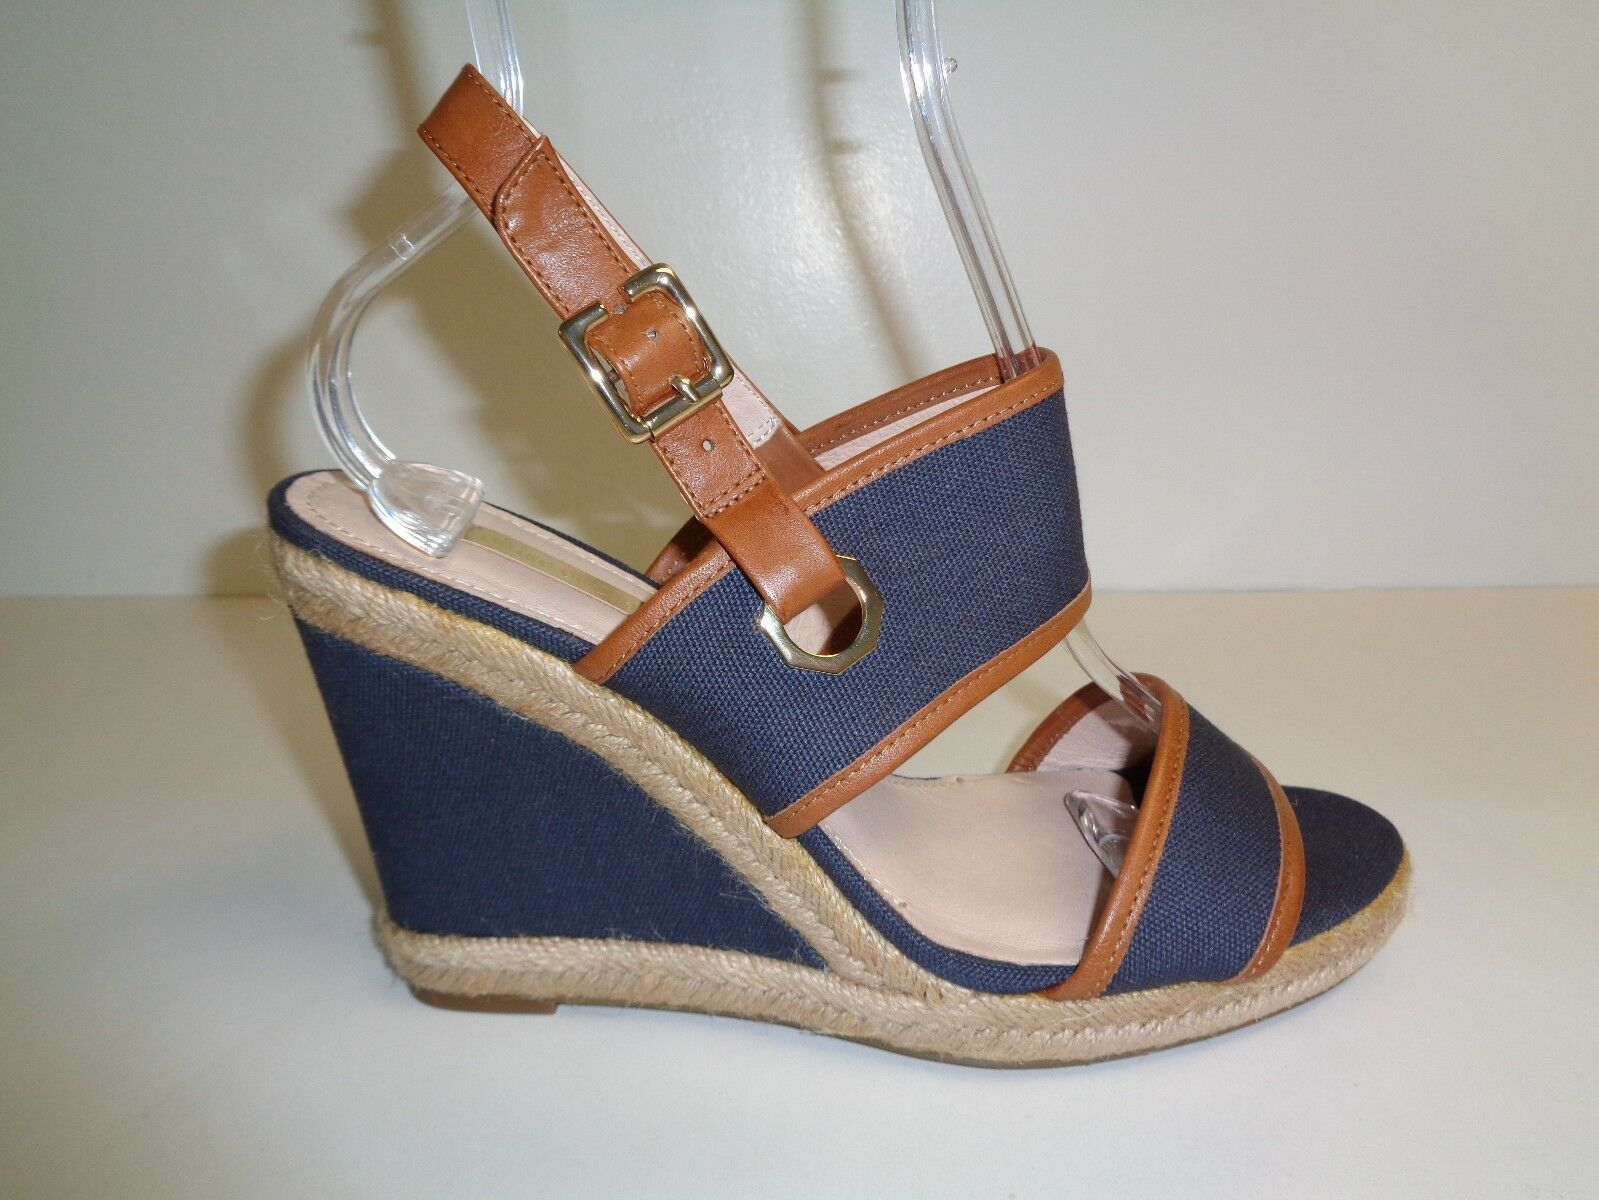 Louise et Cie Größe 9.5 M REBEKAH Navy Leder Fabric Sandales NEU Damenschuhe Schuhes